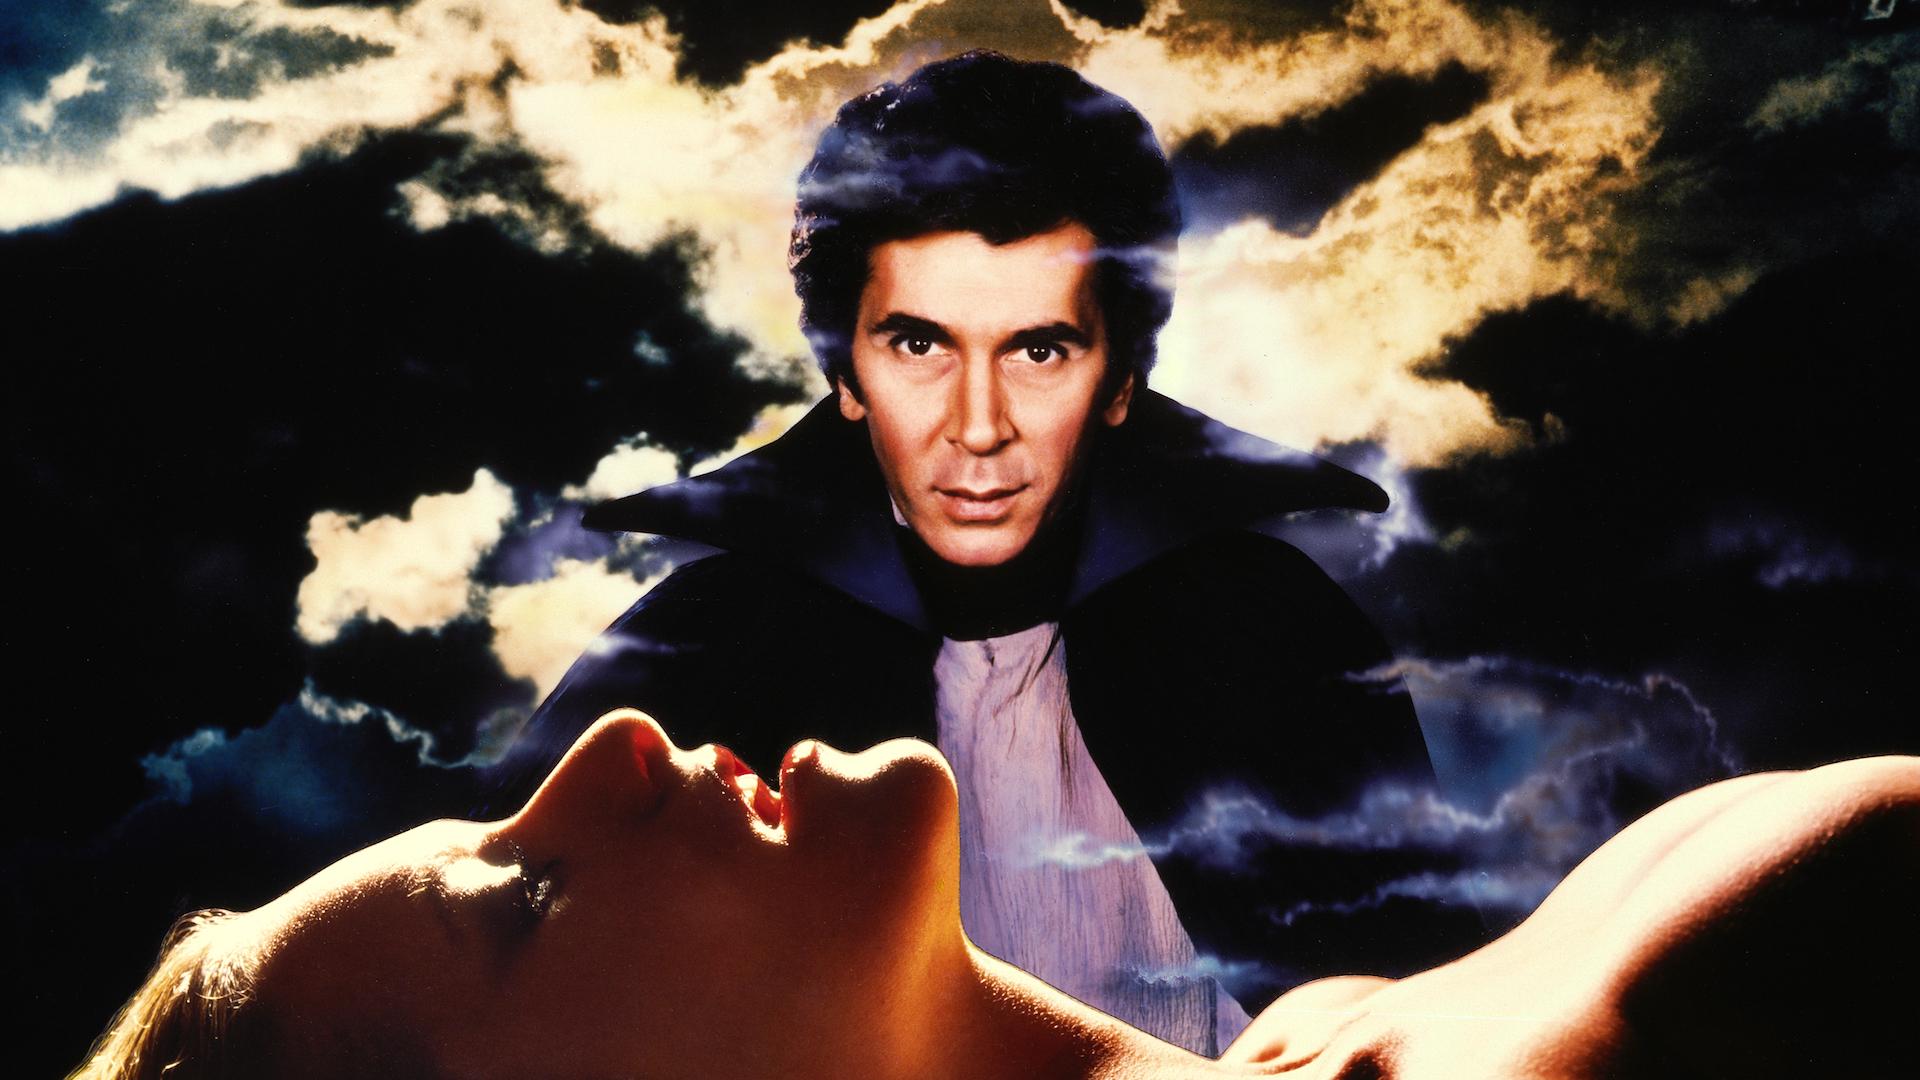 Frank Langella in Dracula